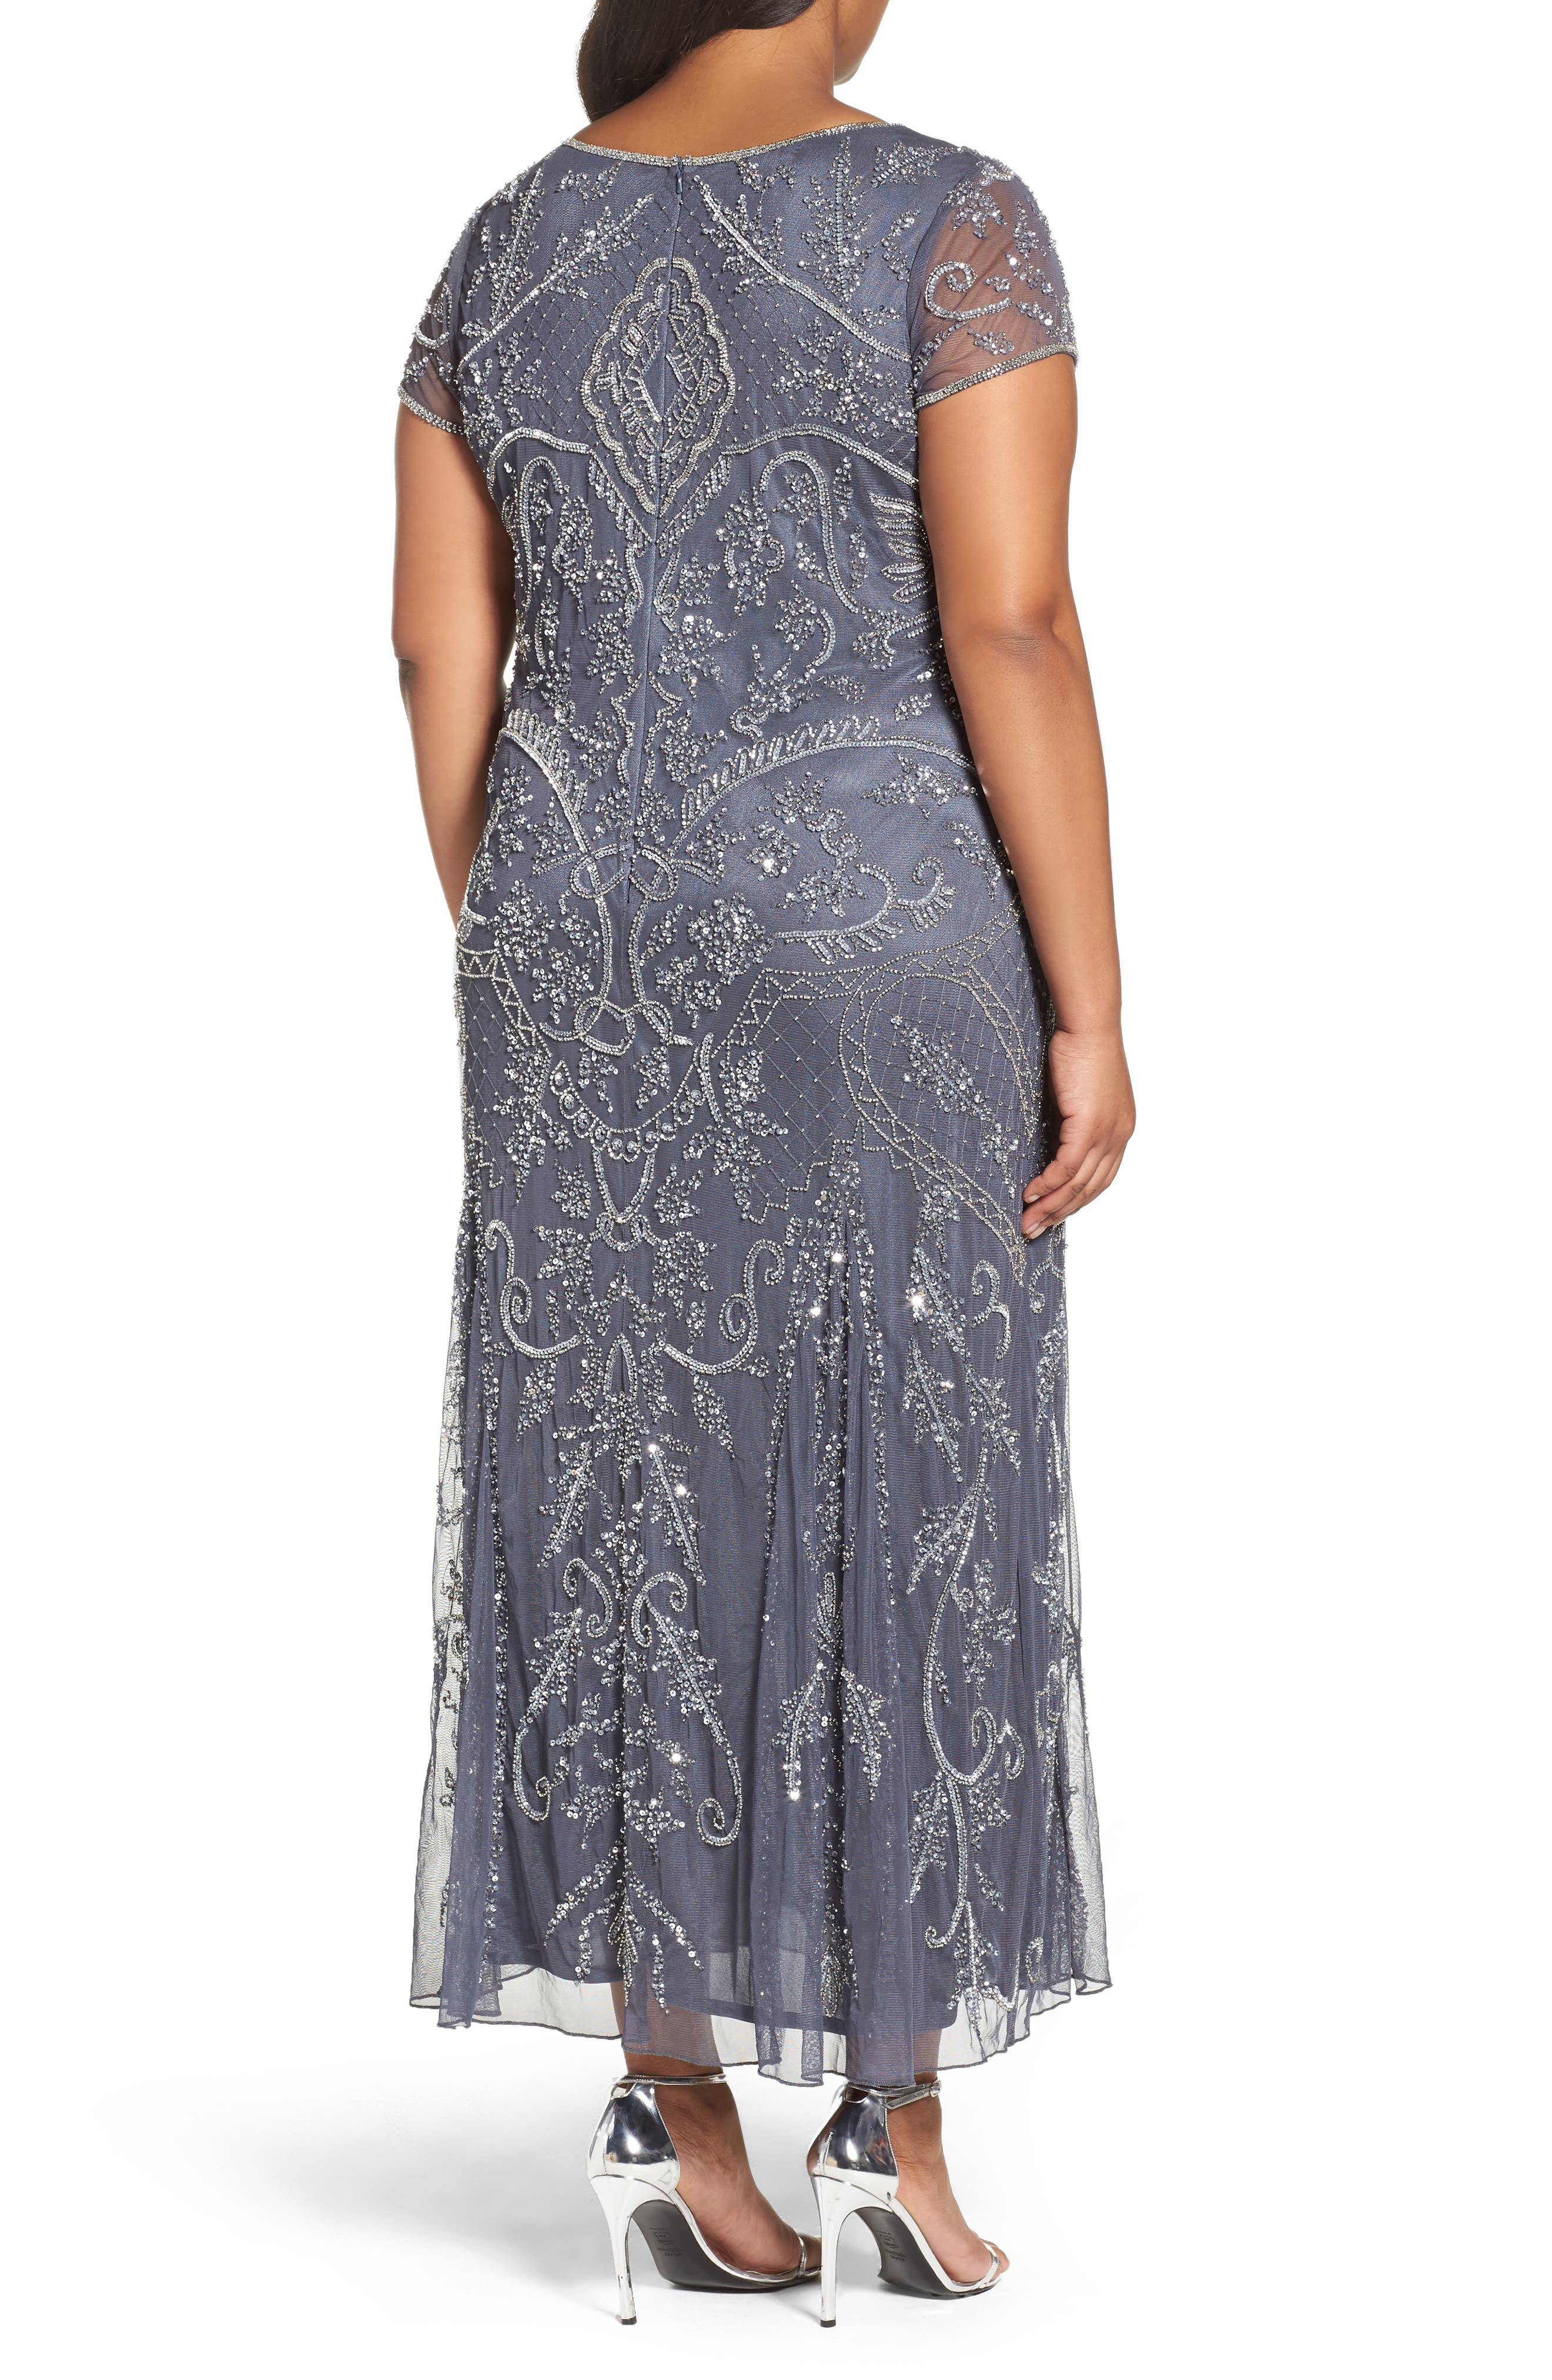 c68b429927 Plus-Size Dresses